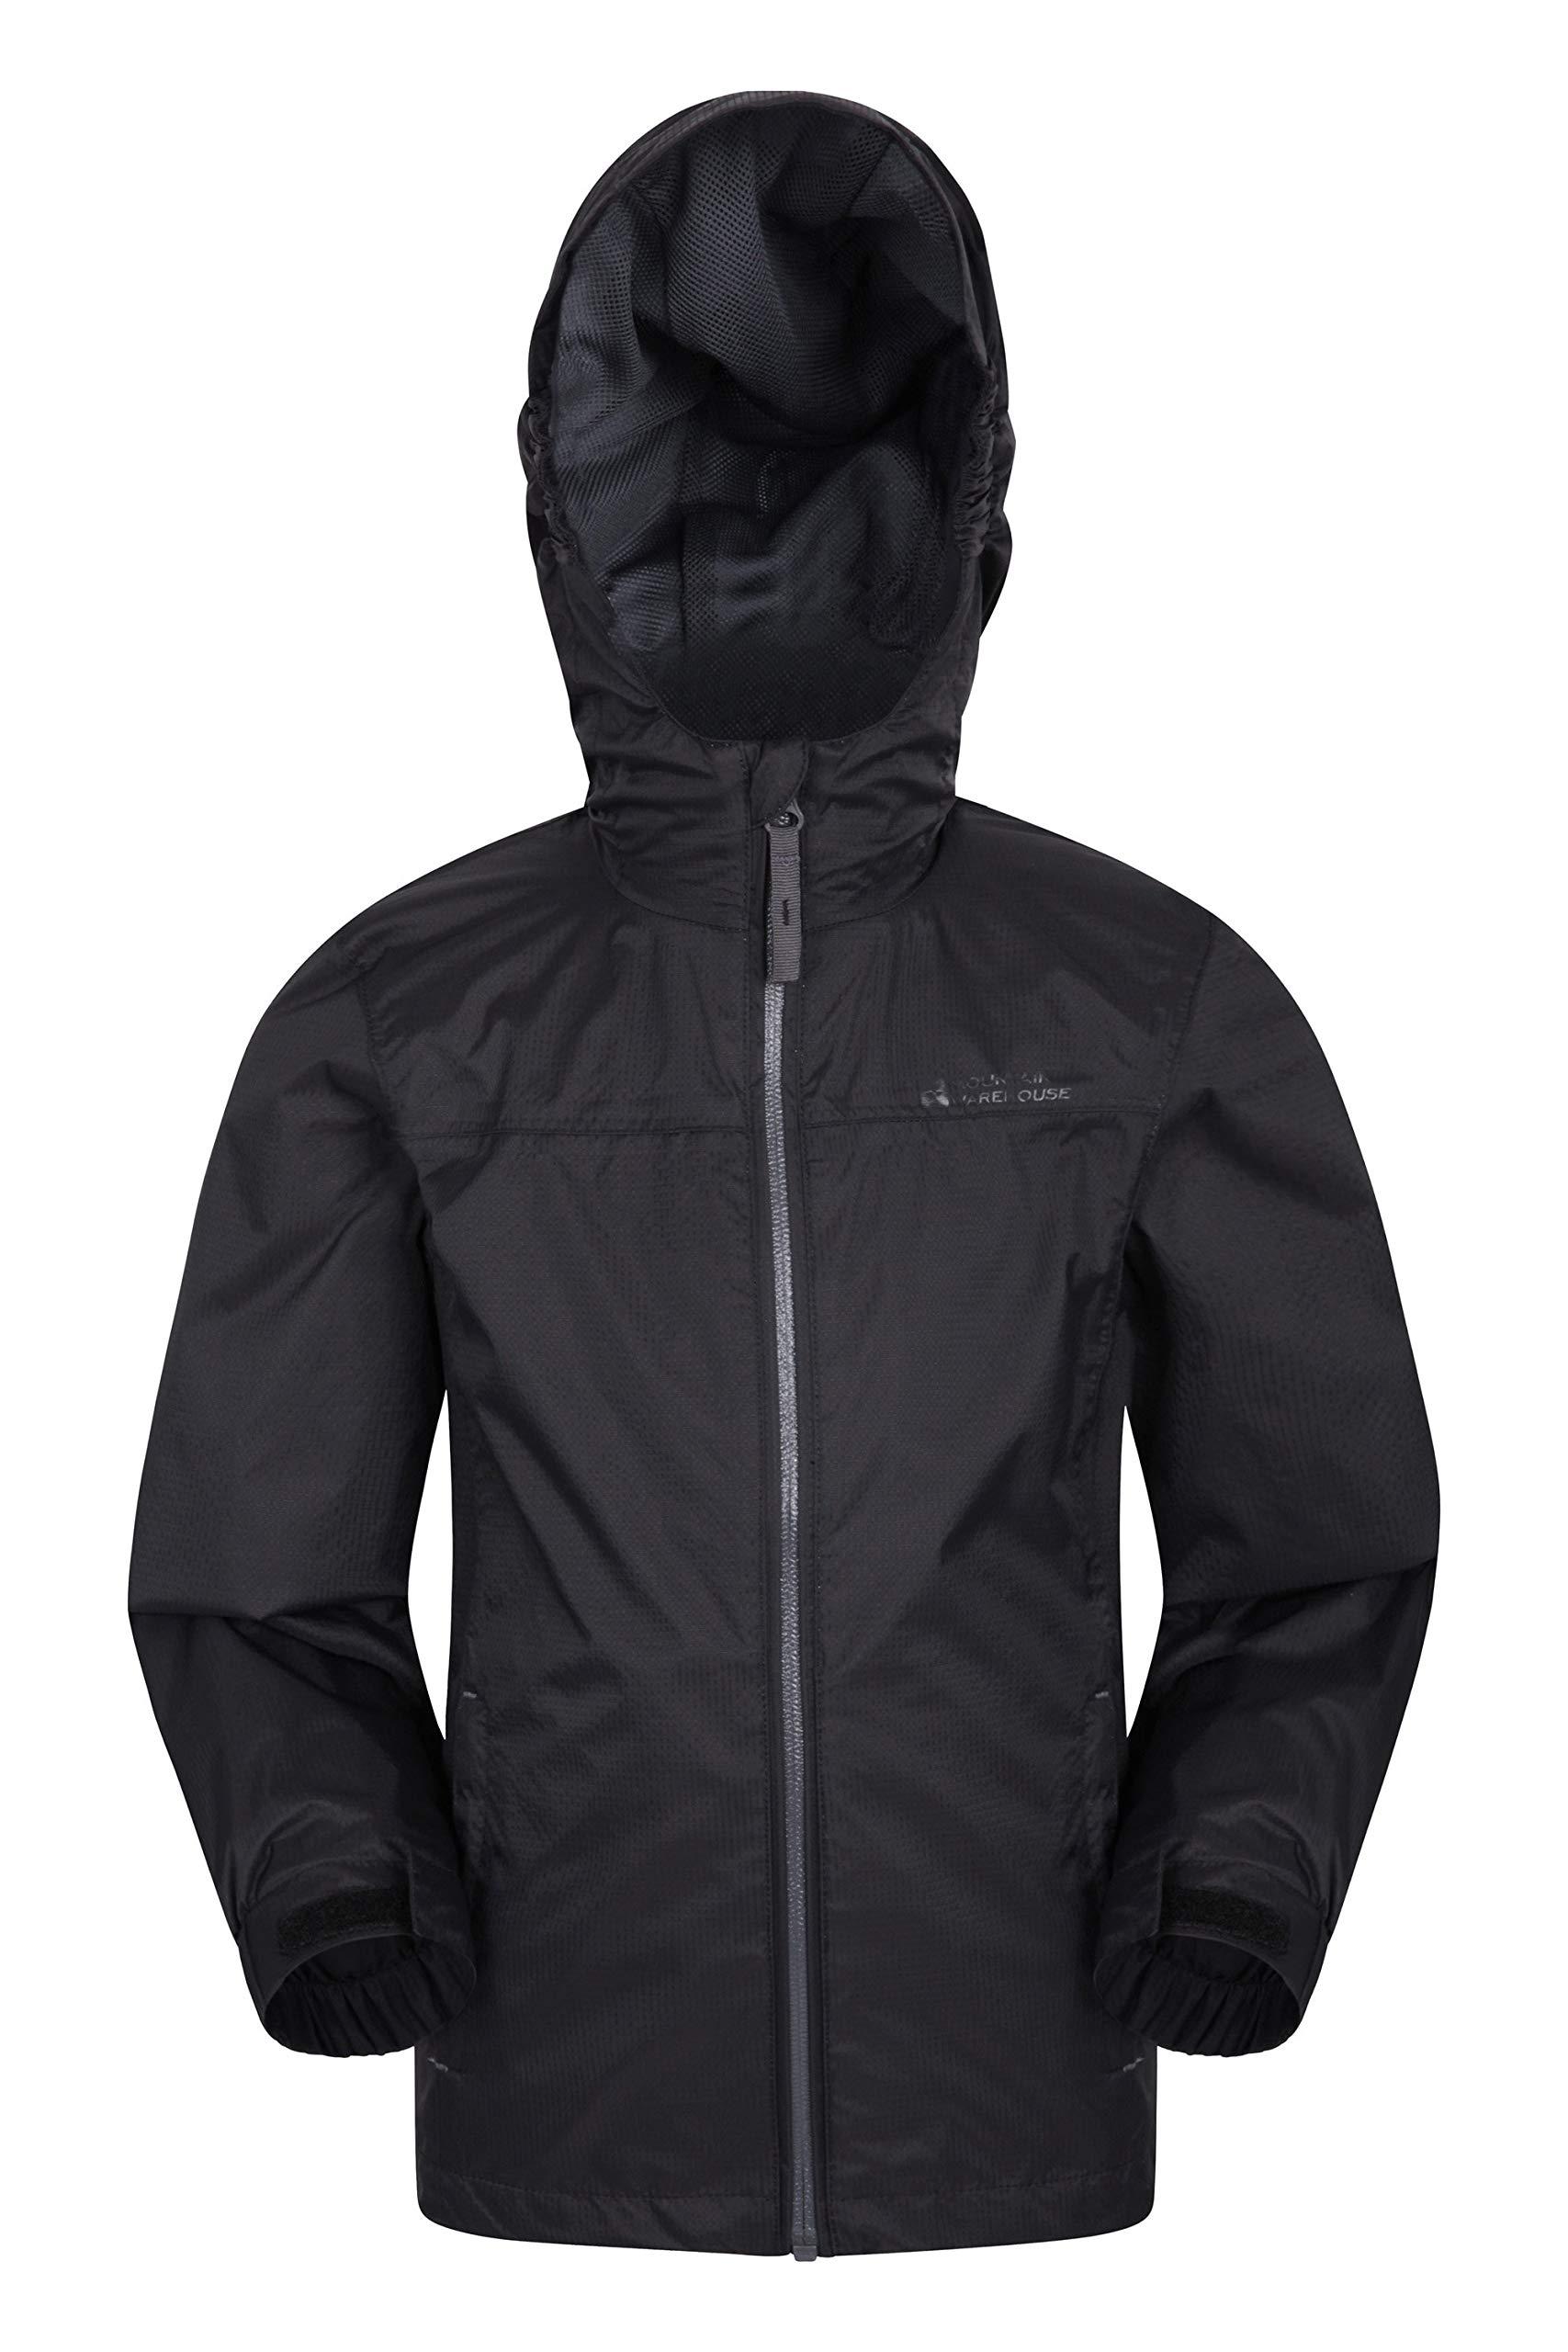 Boys Girls Trespass Qikpac Waterproof Jacket Unisex Kids Breathable Raincoat